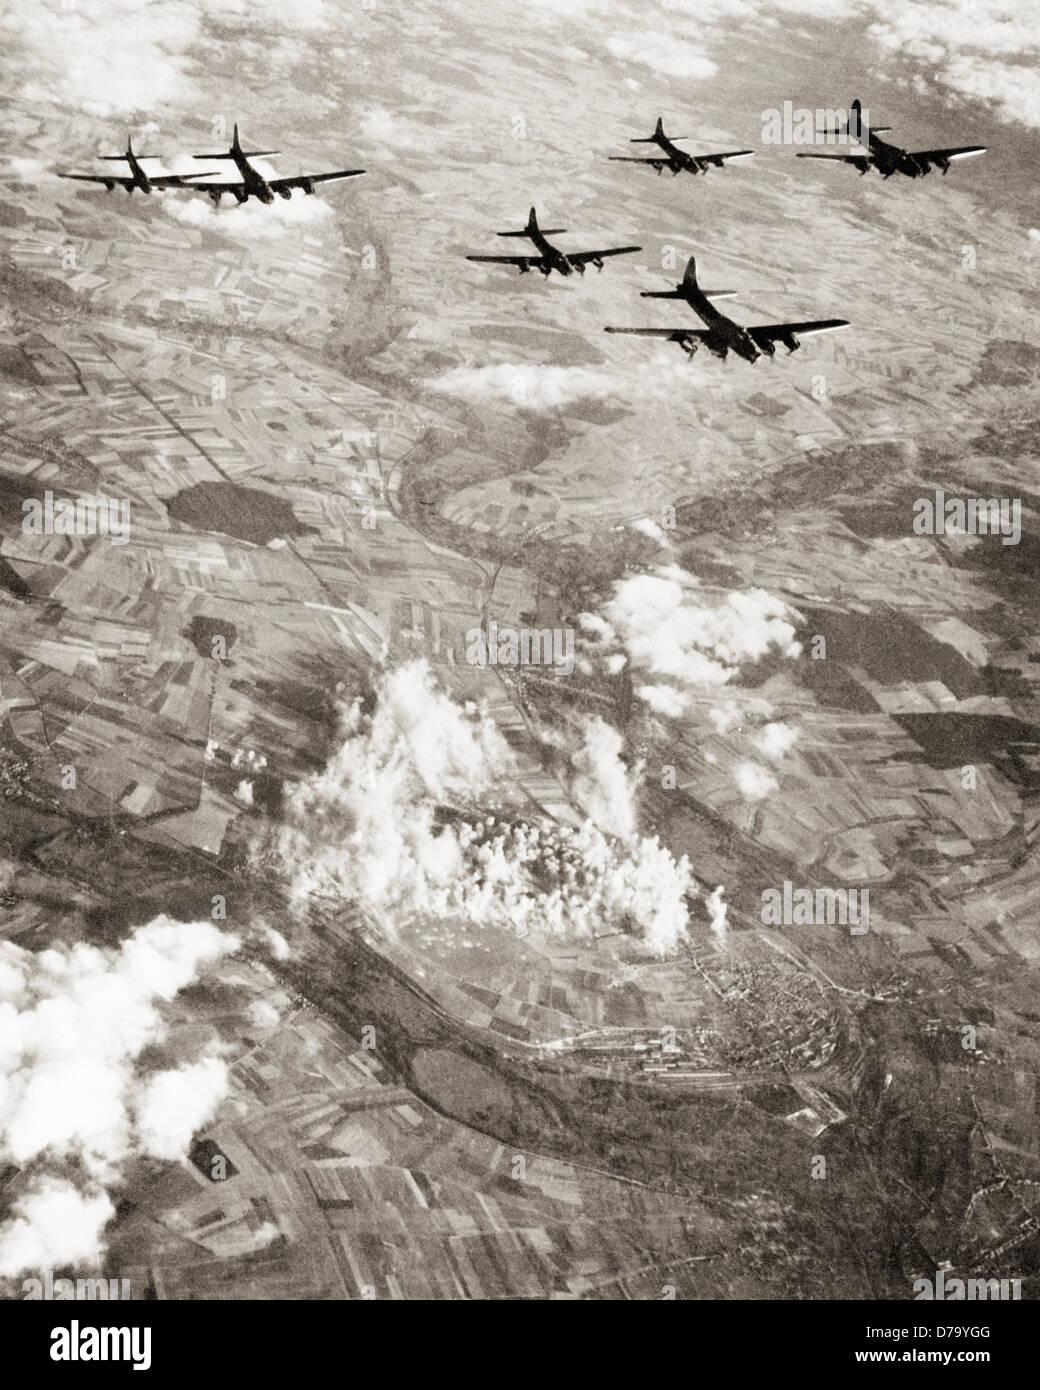 US B-17 Flying Fortresses Carpet Bombing Stock Photo